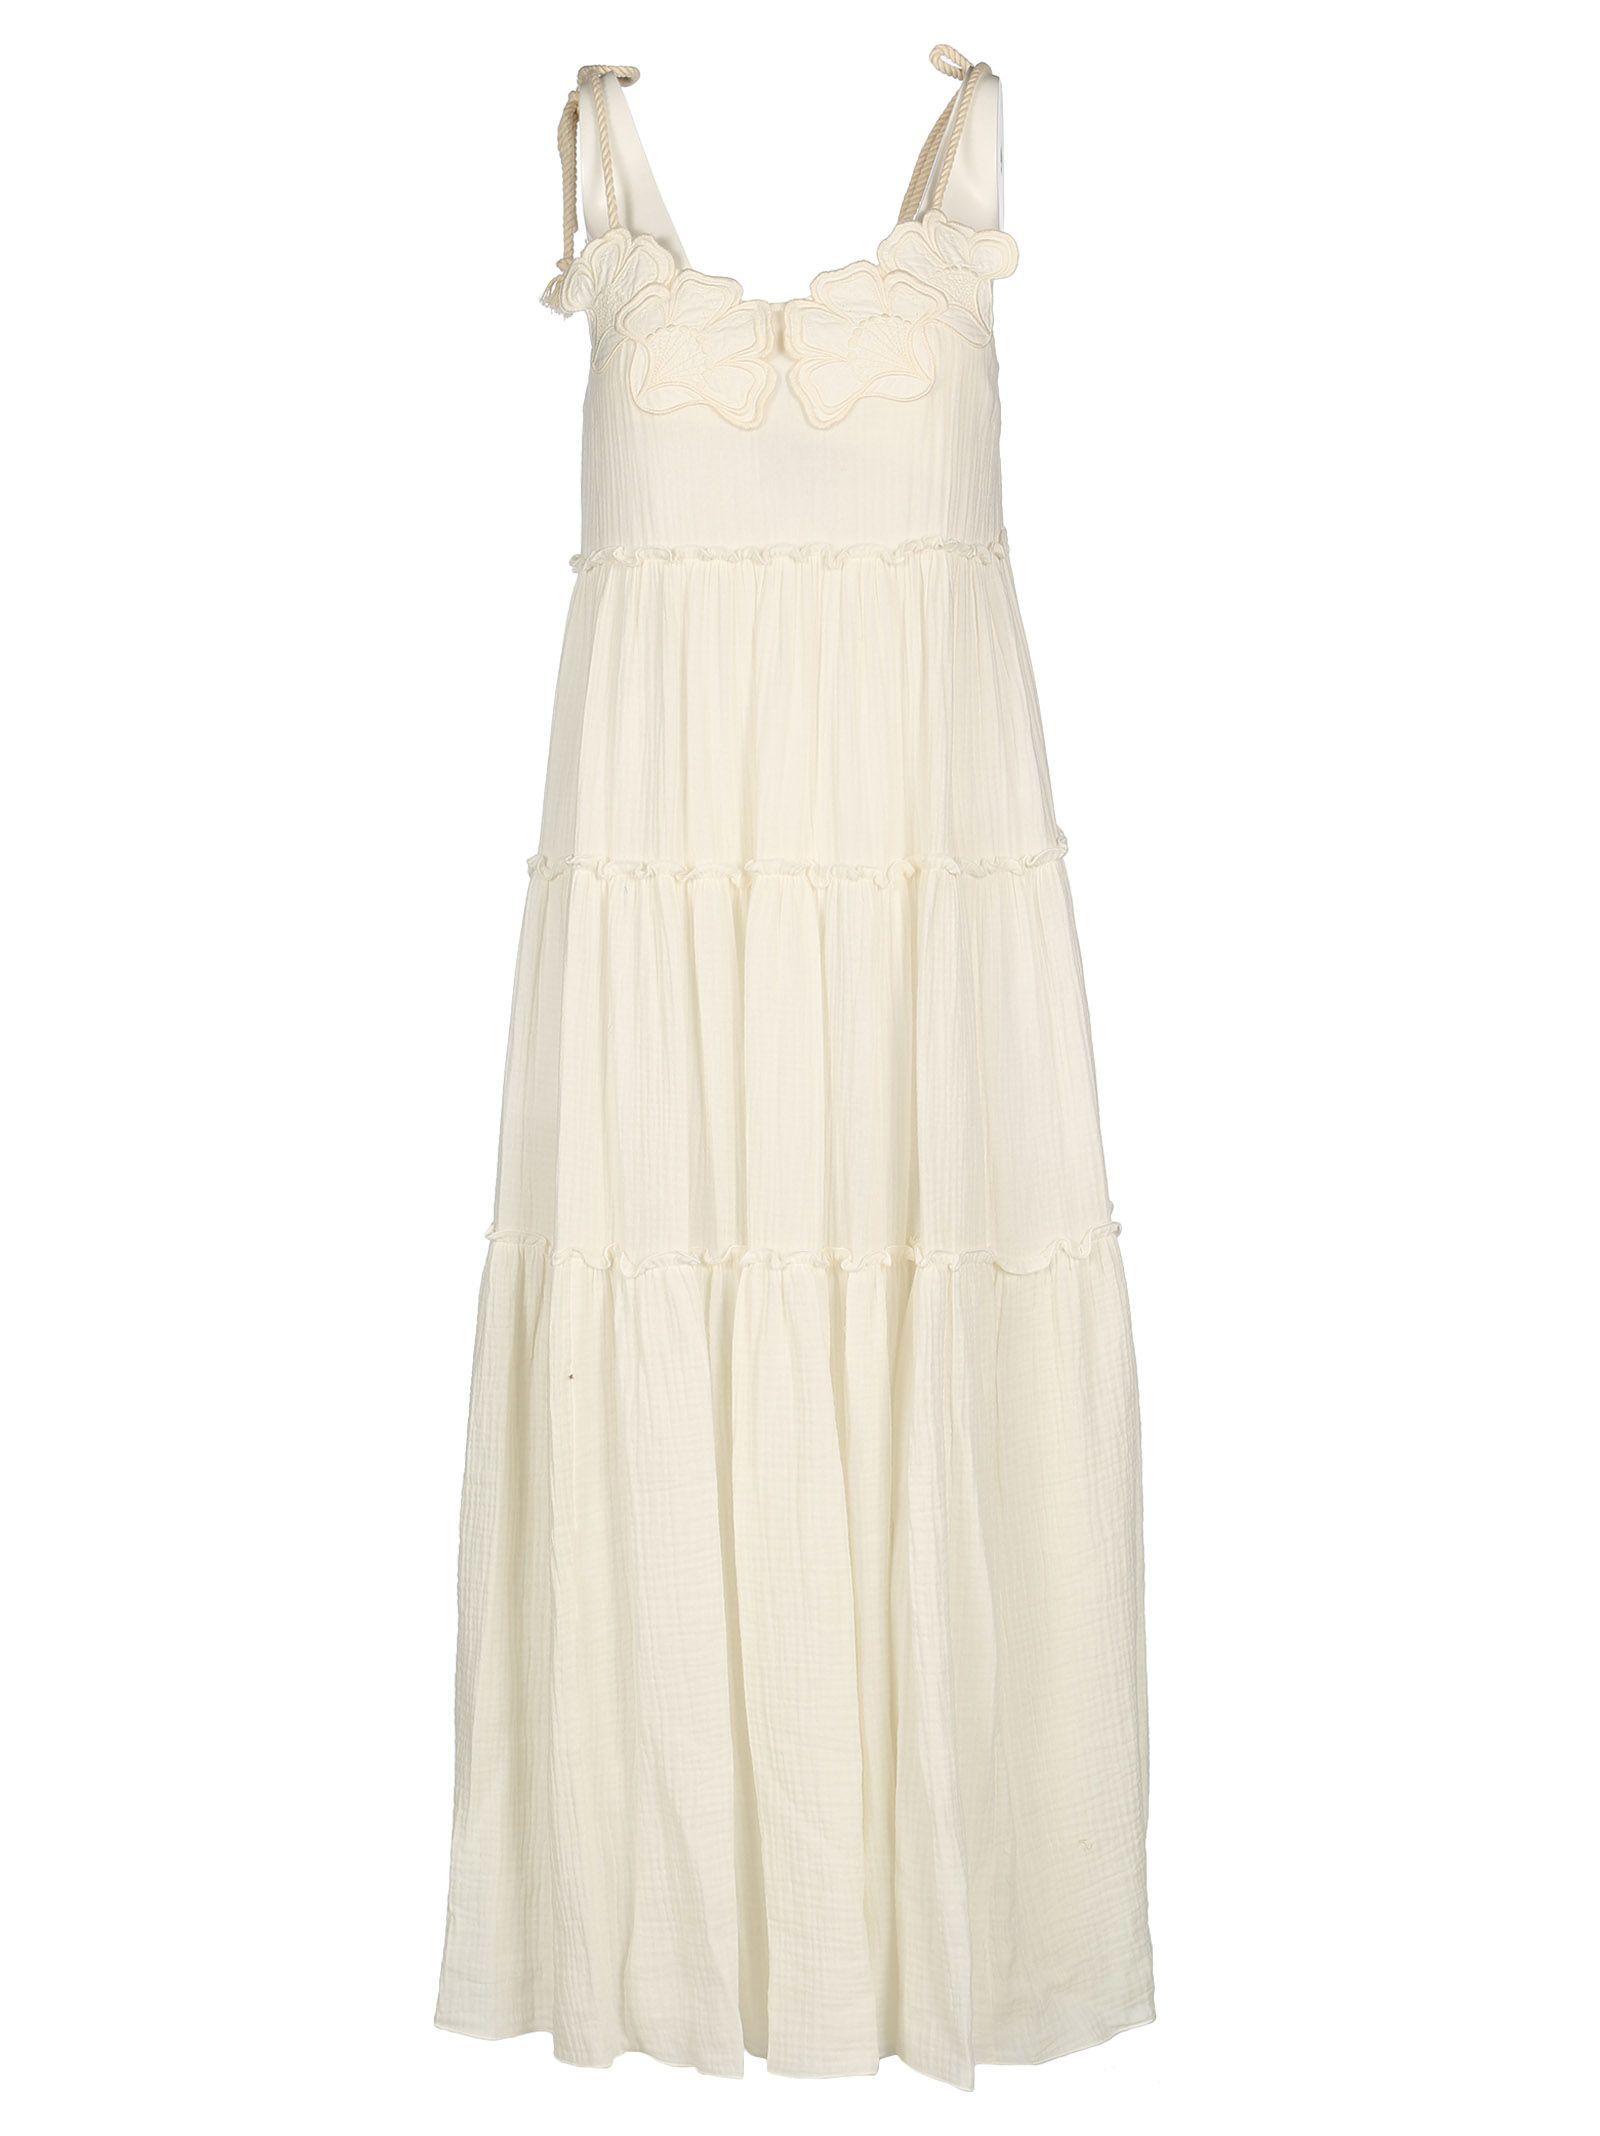 92d723c0 SEE BY CHLOÉ SEE BY CHLOÉ TIERED MAXI DRESS. #seebychloé #cloth ...